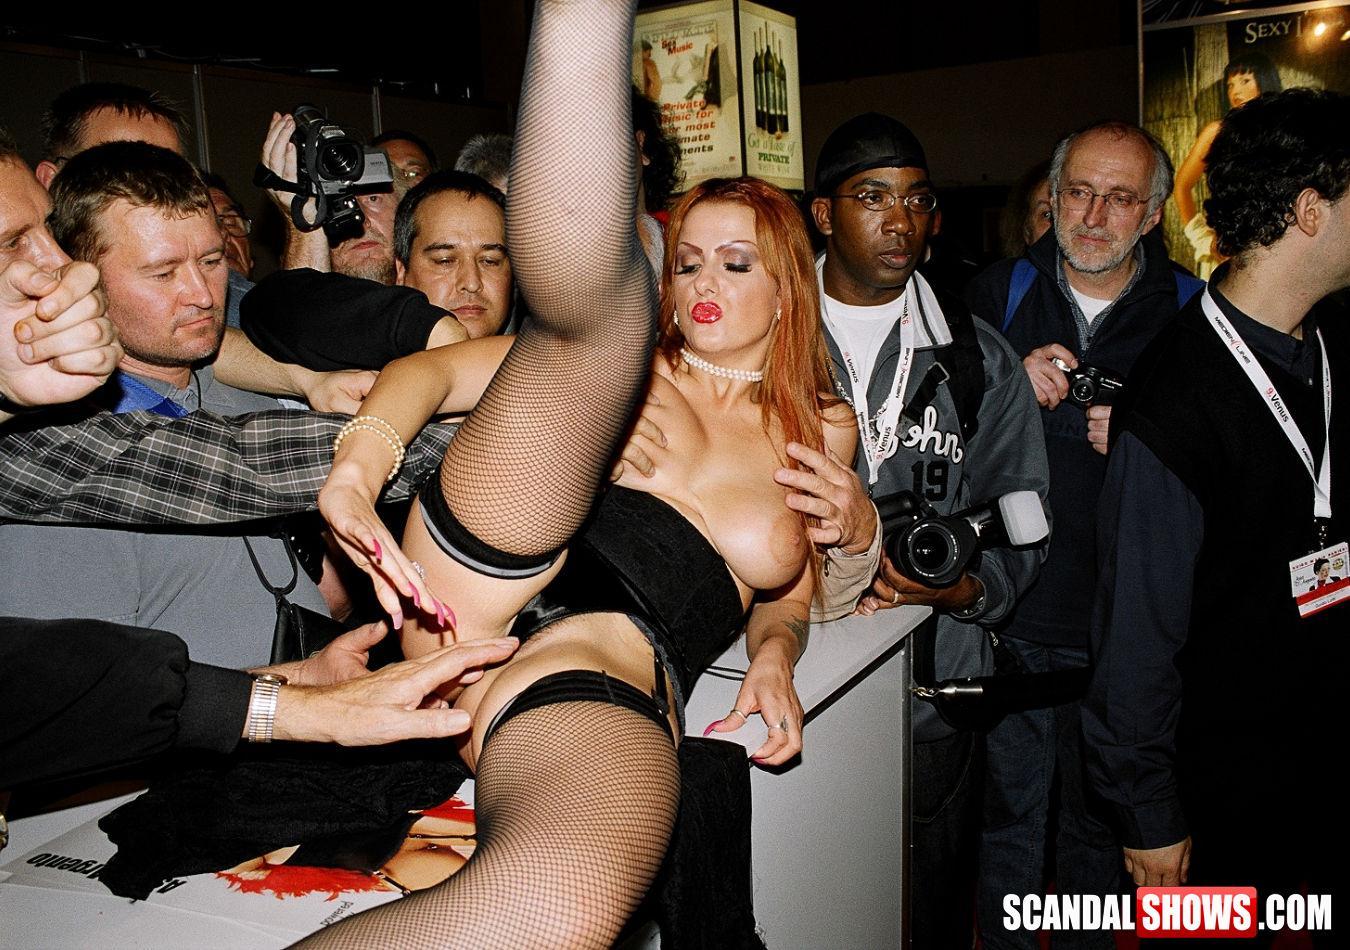 Секс скандалы шоу бизнеса 5 фотография